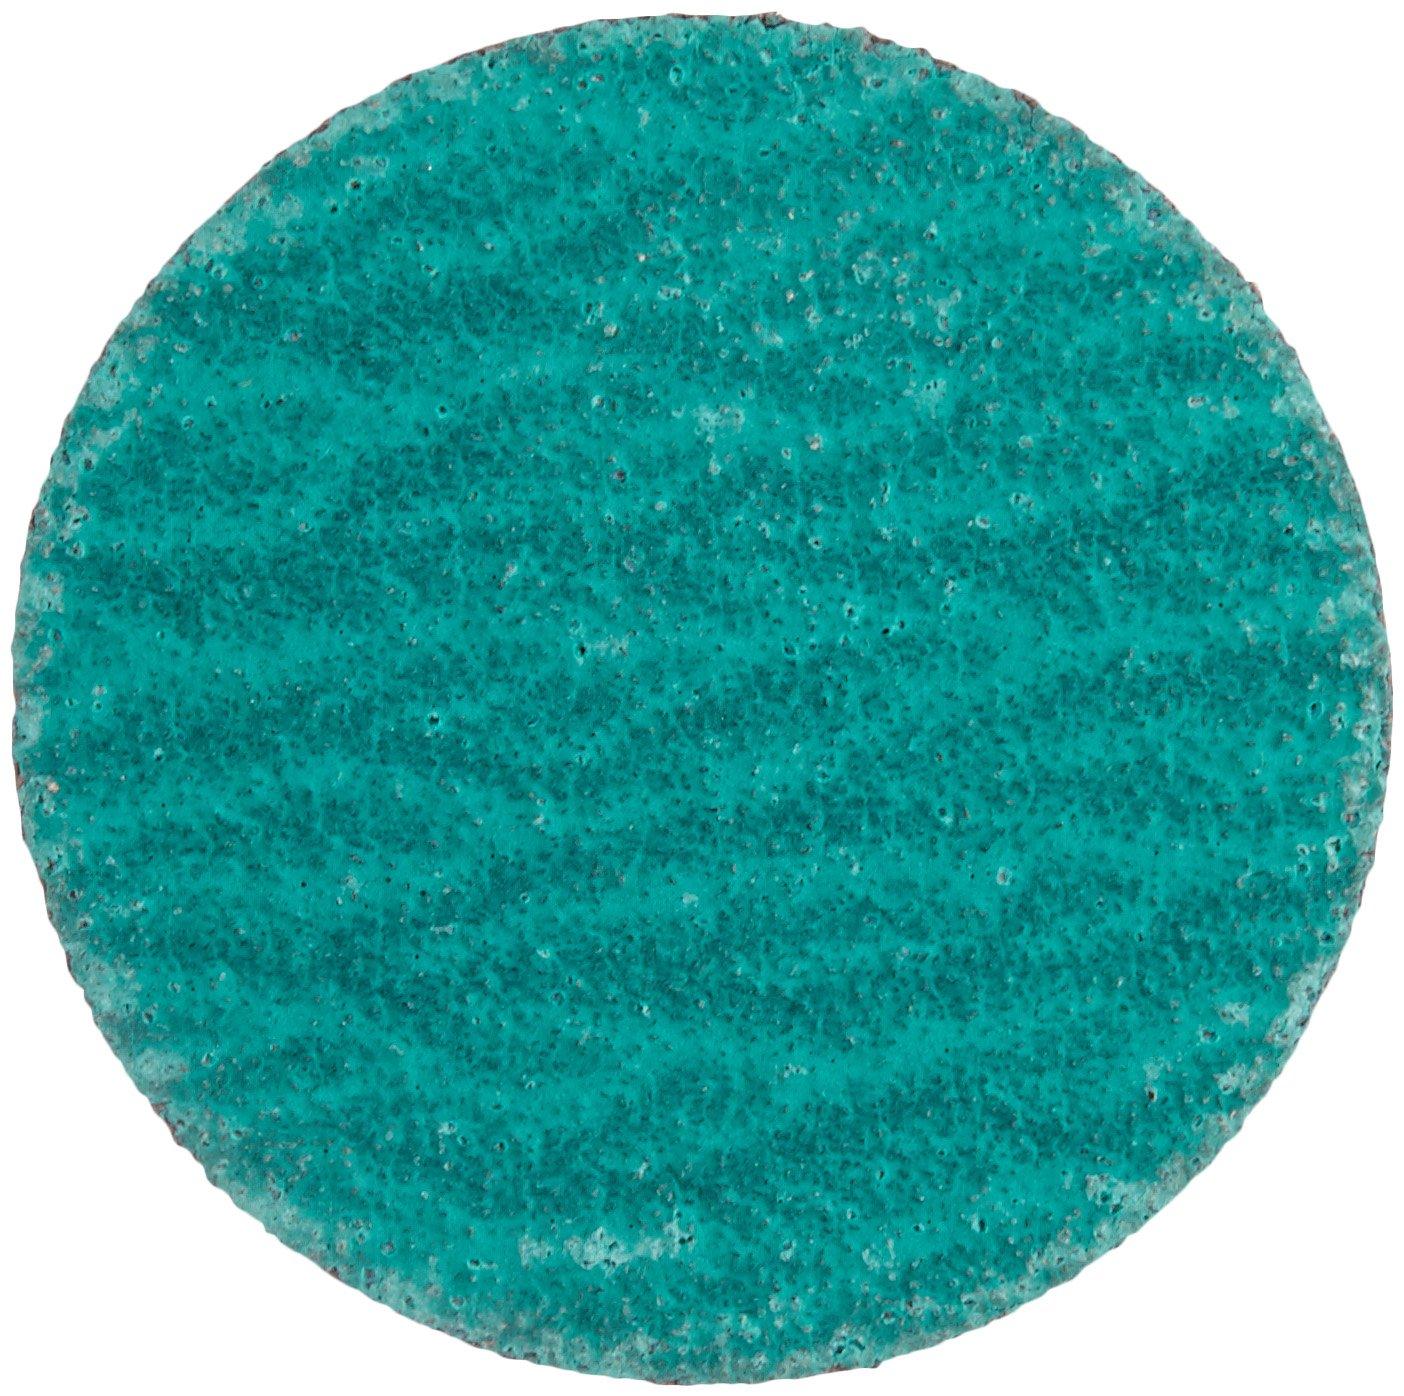 Zirconium 2 Diameter Core-Lock-R Pack of 10 CORE Abrasives 92154 Laminated Quick Change Abrasive Disc 60 Grit Polyester//Cloth Backing 2 Diameter CoreTemp Abrasives